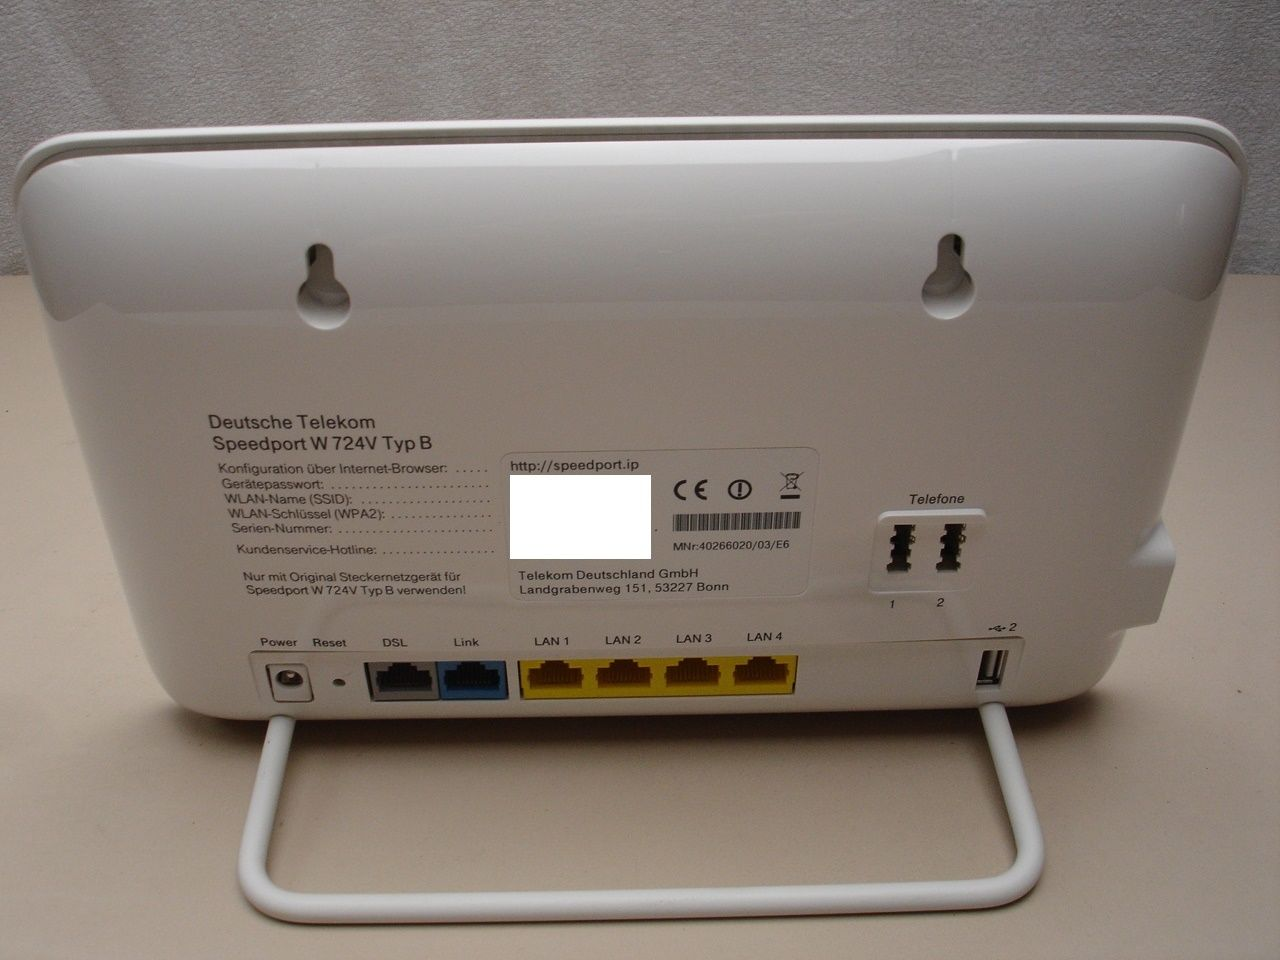 Telekom Router W724V an 1&1-DSL-Anschluss - ComputerBase Forum